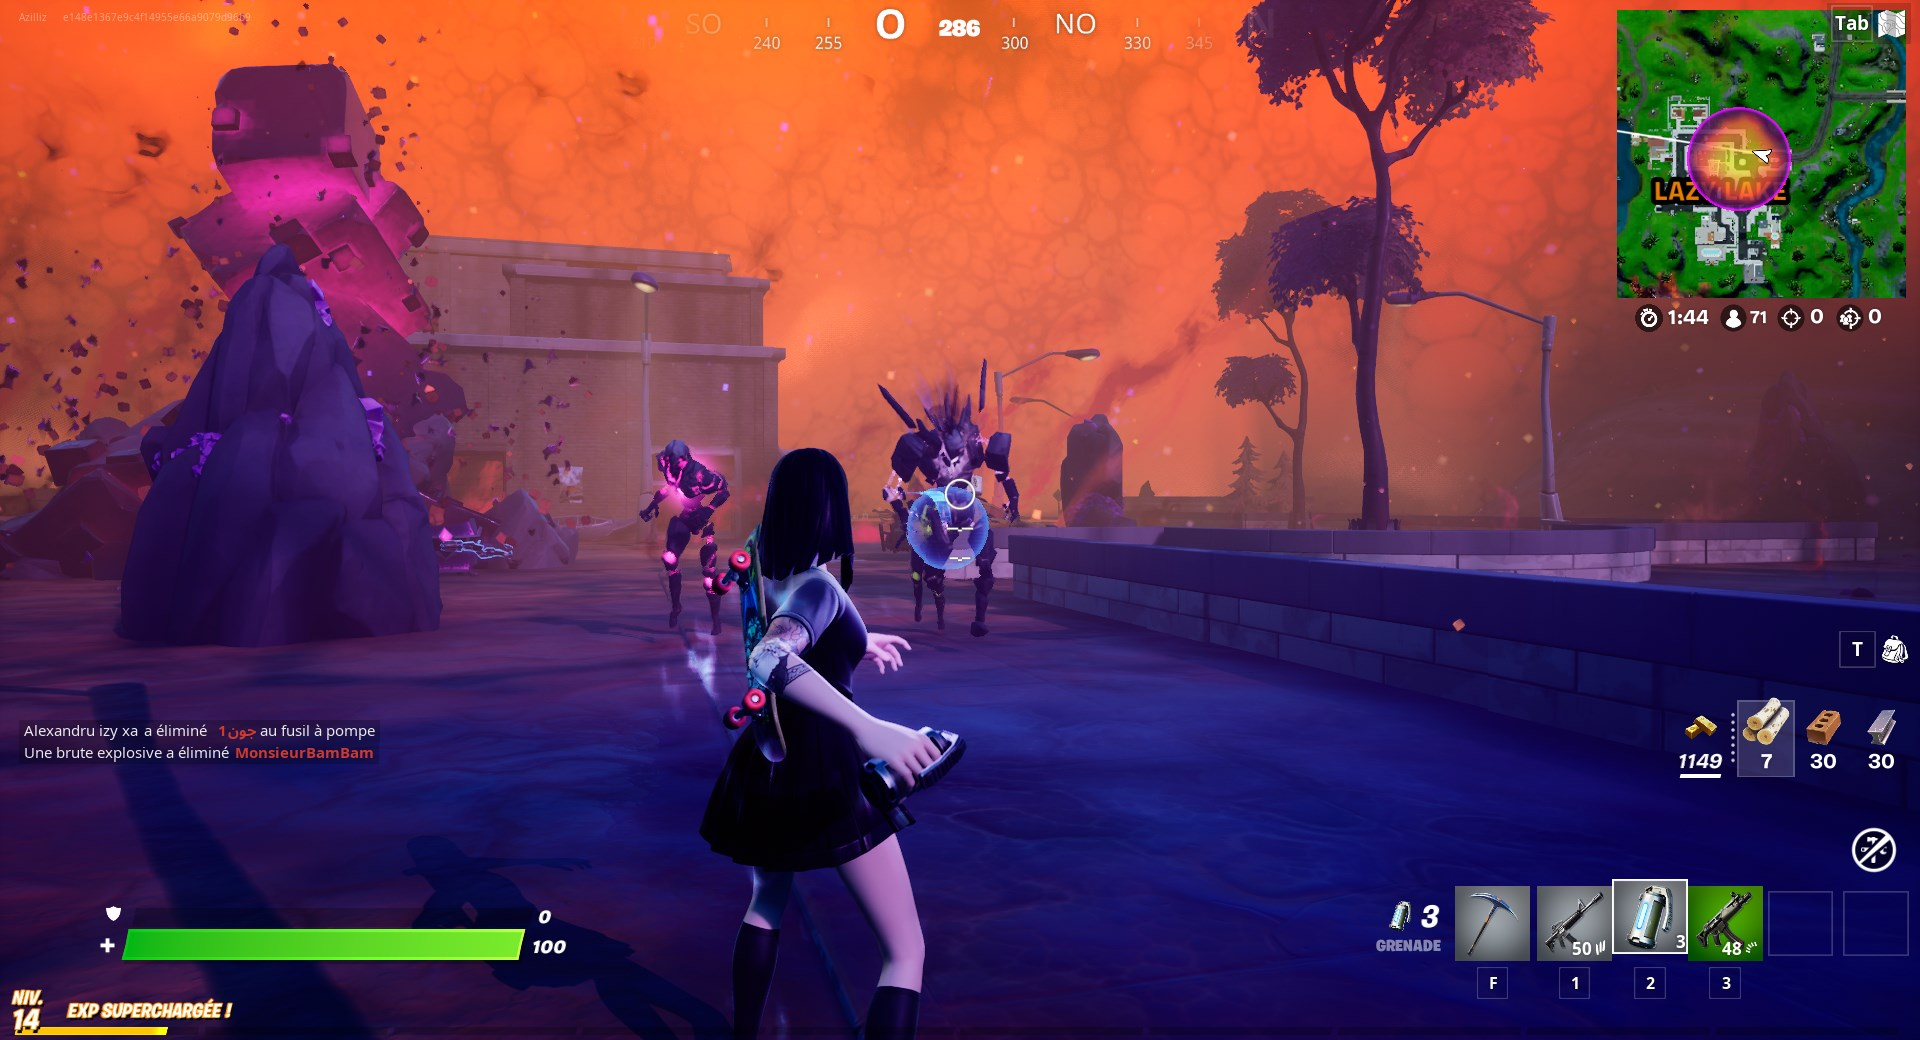 elimination-arme-explosive-monstre-cube-fortnite